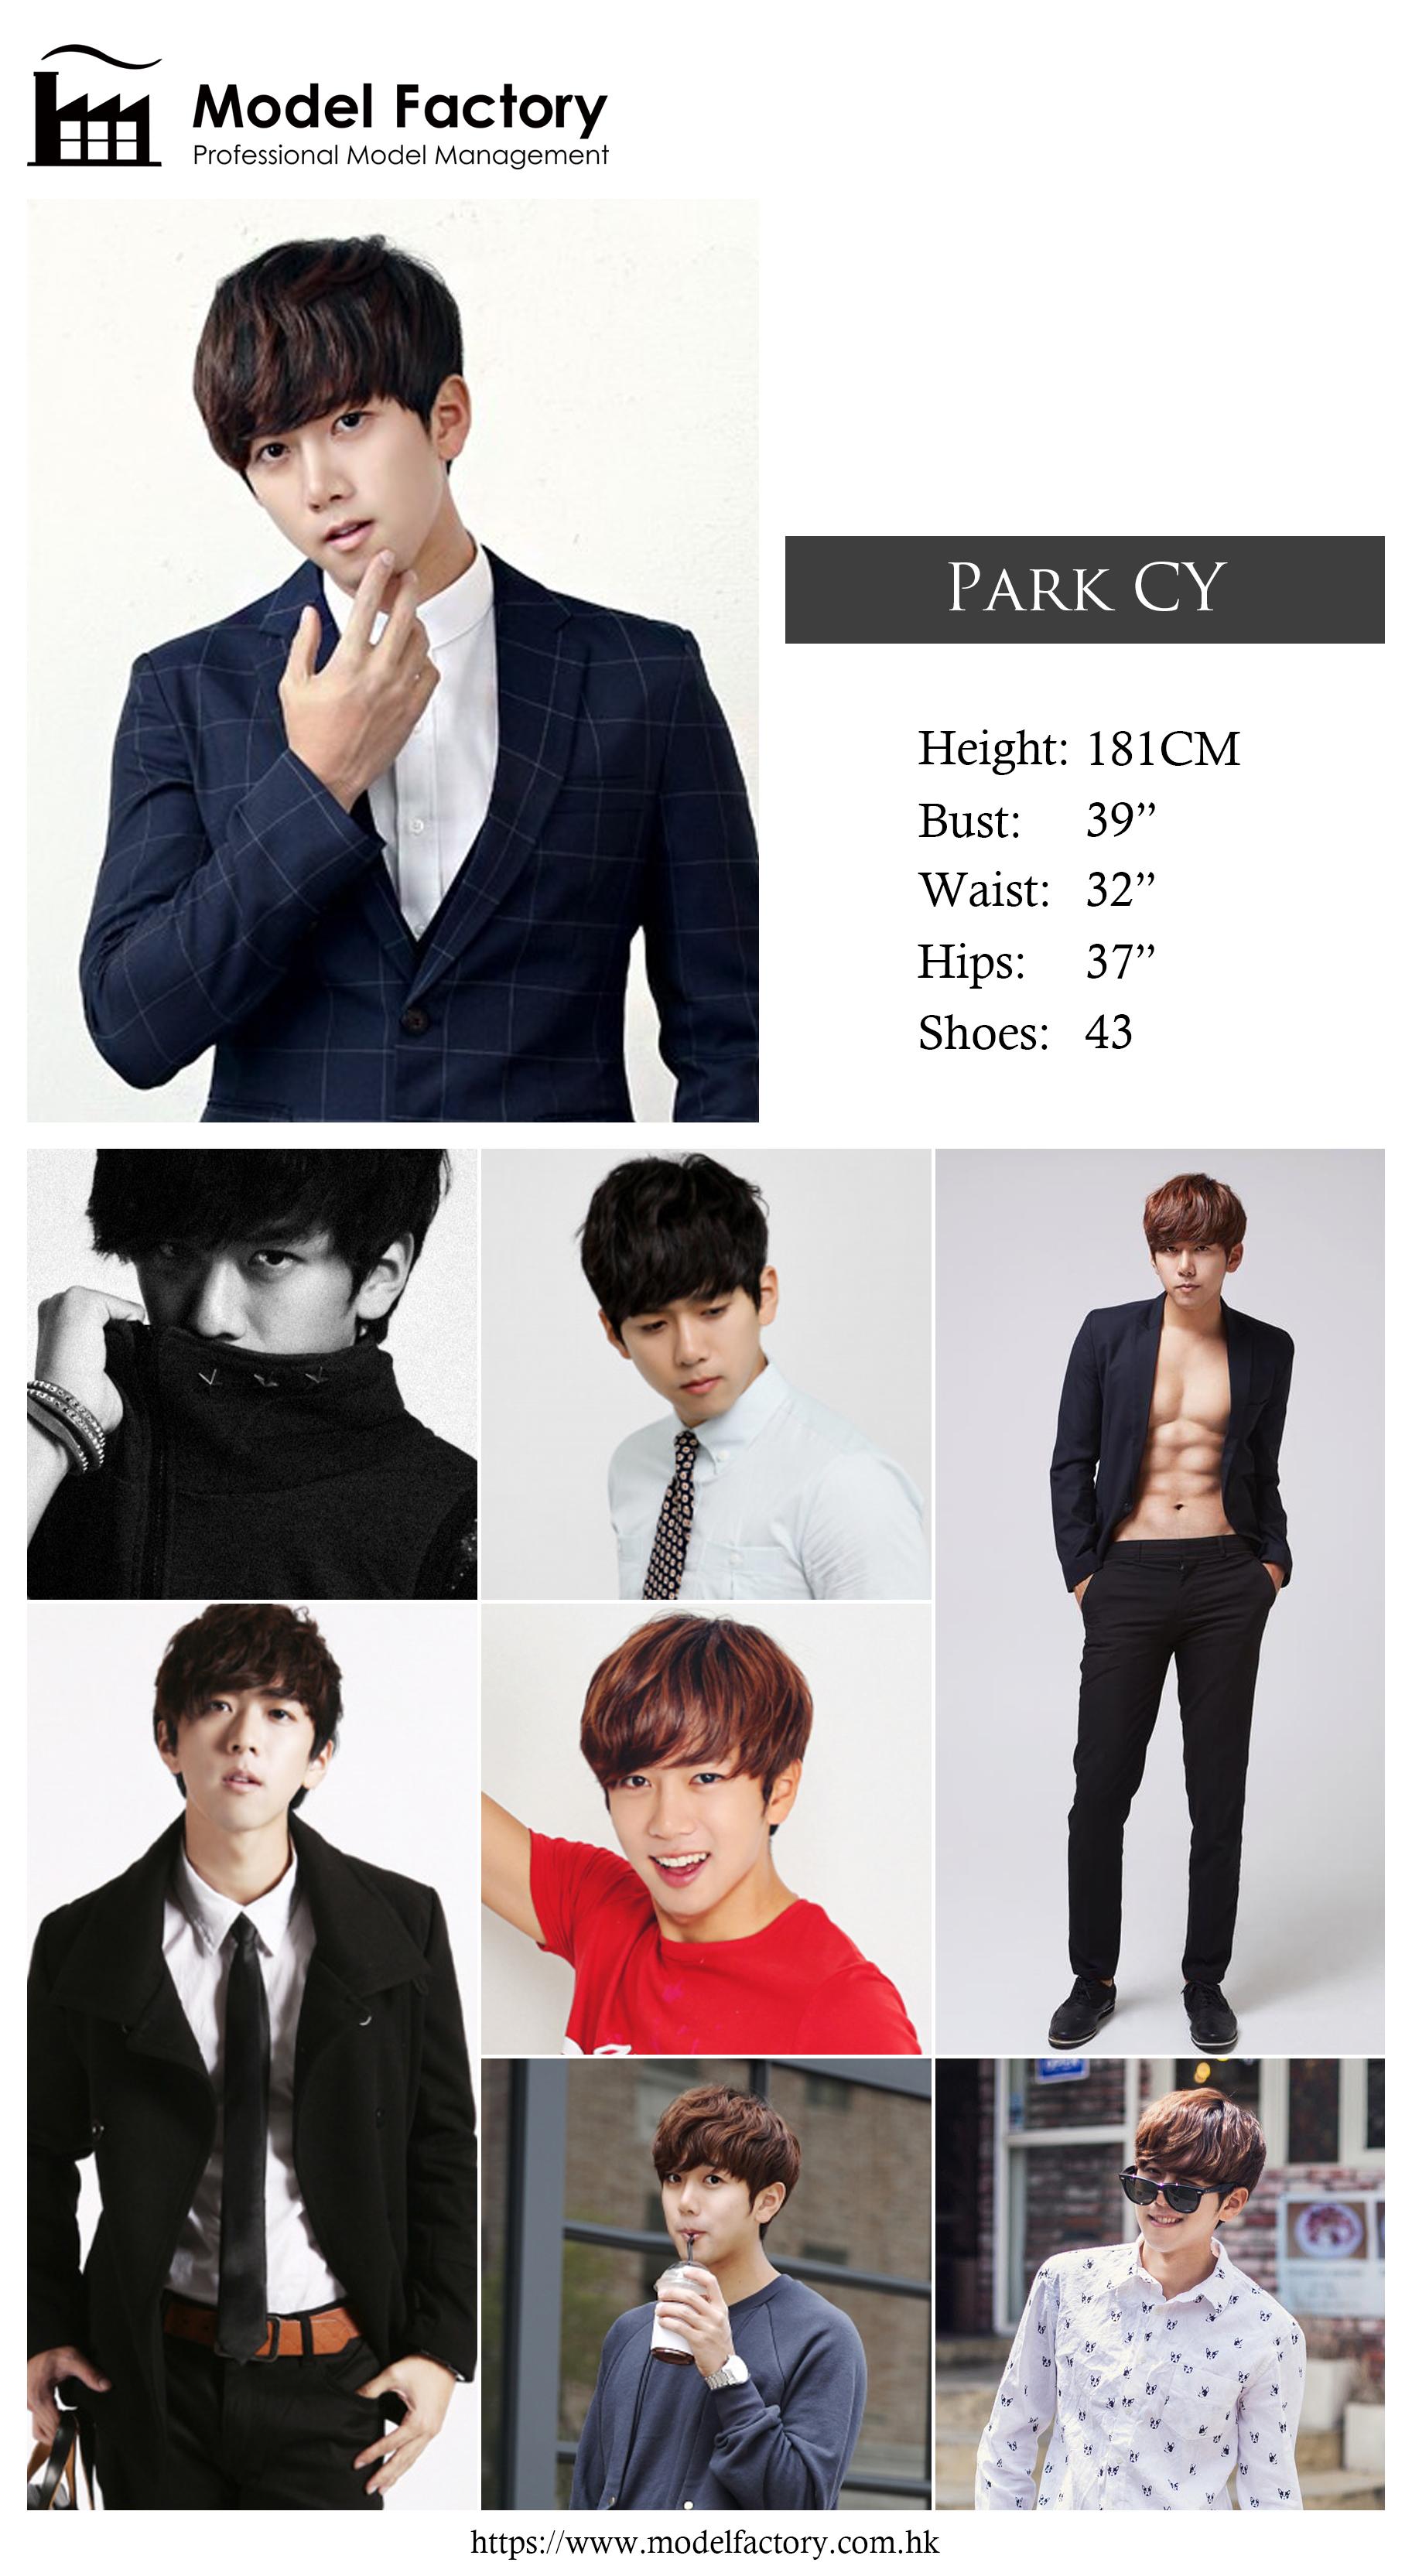 Model Factory Korean Male Model ParkCY